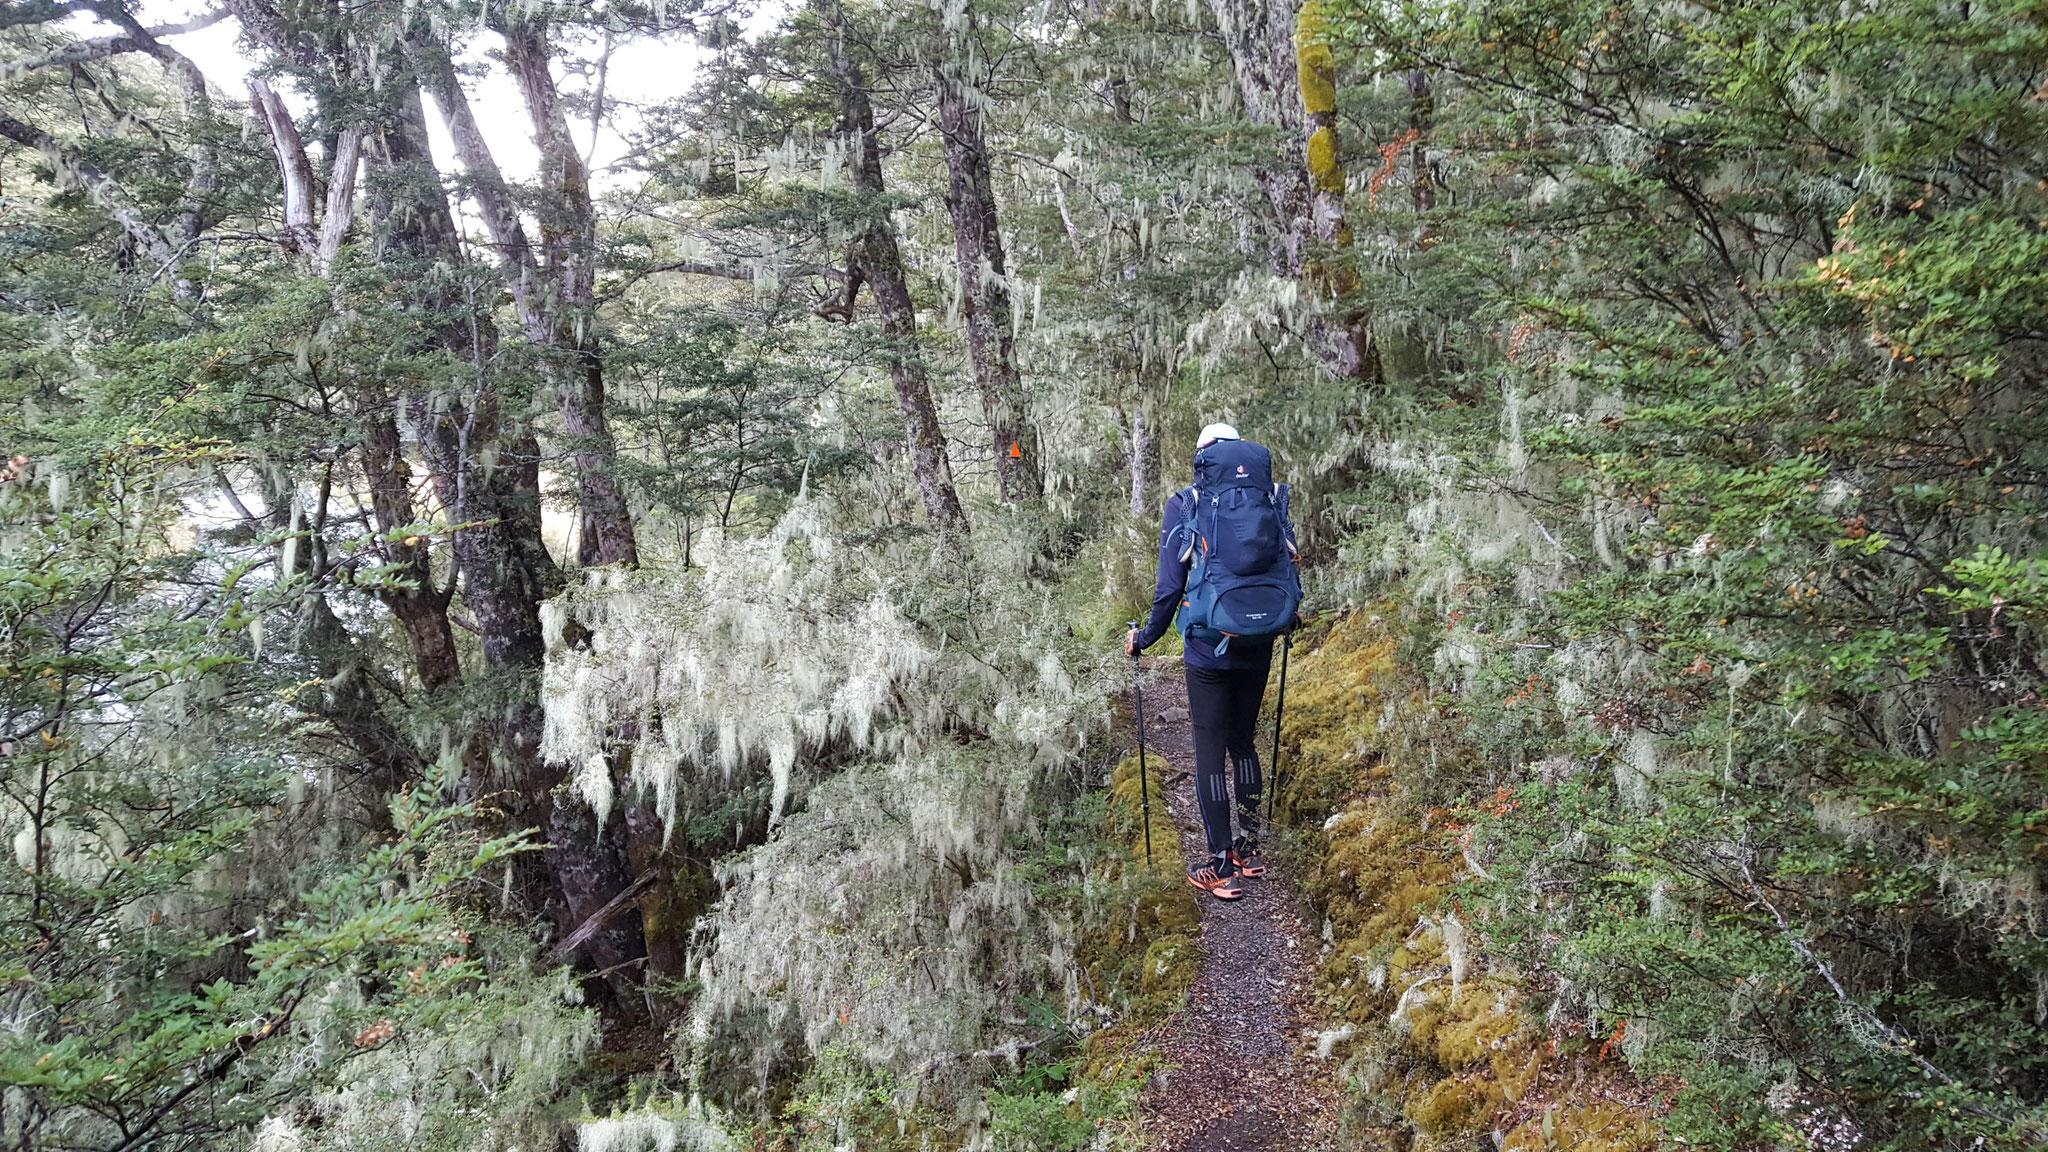 Te Araroa nach einem Regentag blüht das Moos